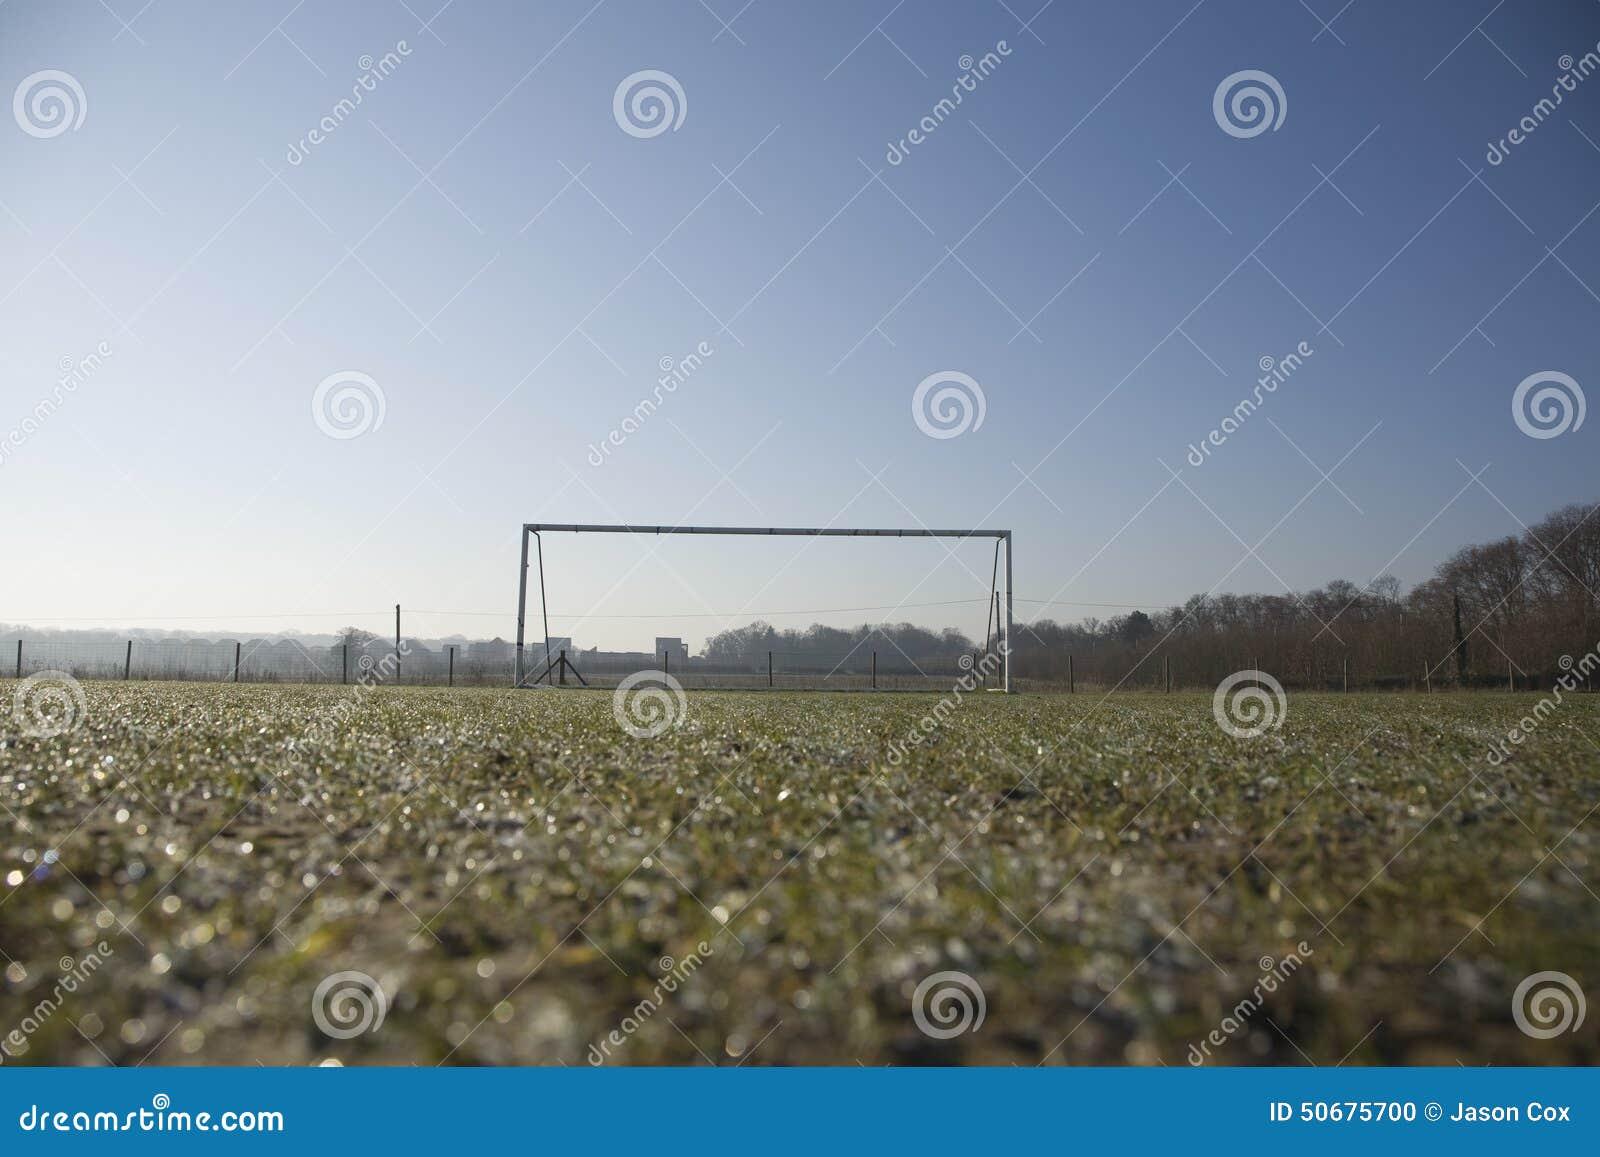 Download 空的橄榄球球场和冷淡的冬天早晨 库存照片. 图片 包括有 星期天, 同盟, 体育运动, 水平, 间距, 冬天 - 50675700